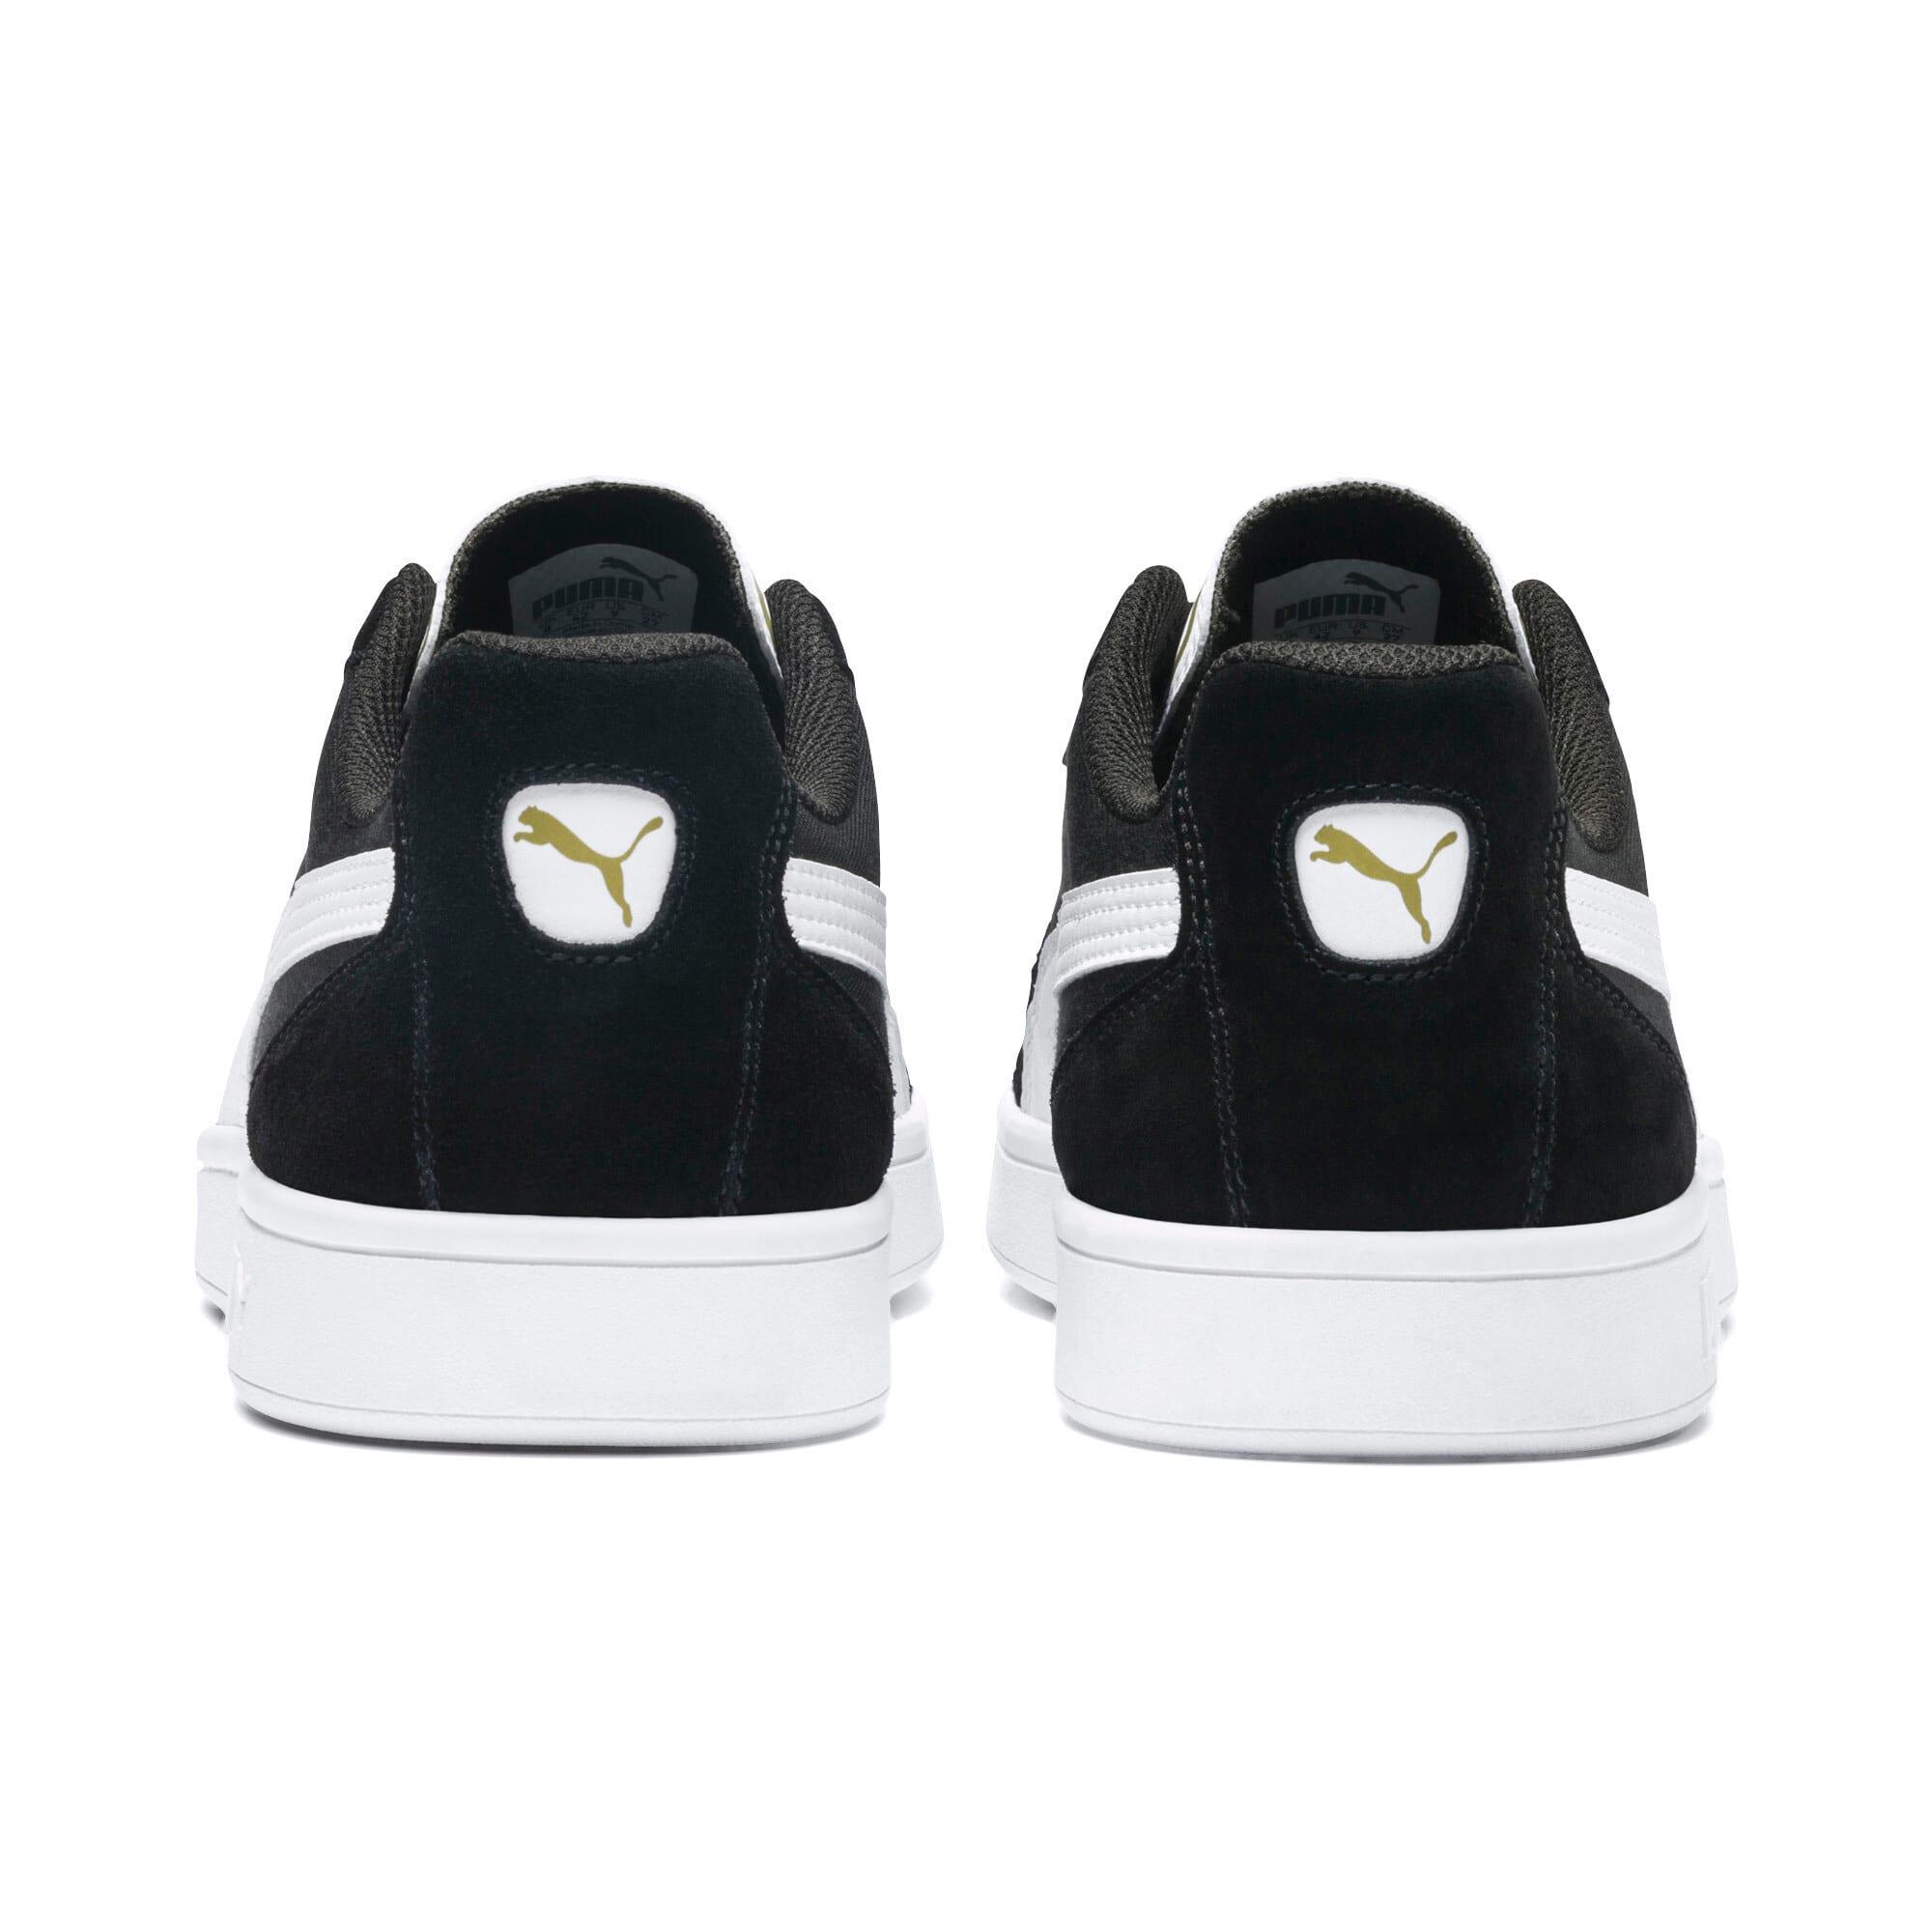 Thumbnail 4 of Astro Kick Sneakers, Puma Black-Puma White, medium